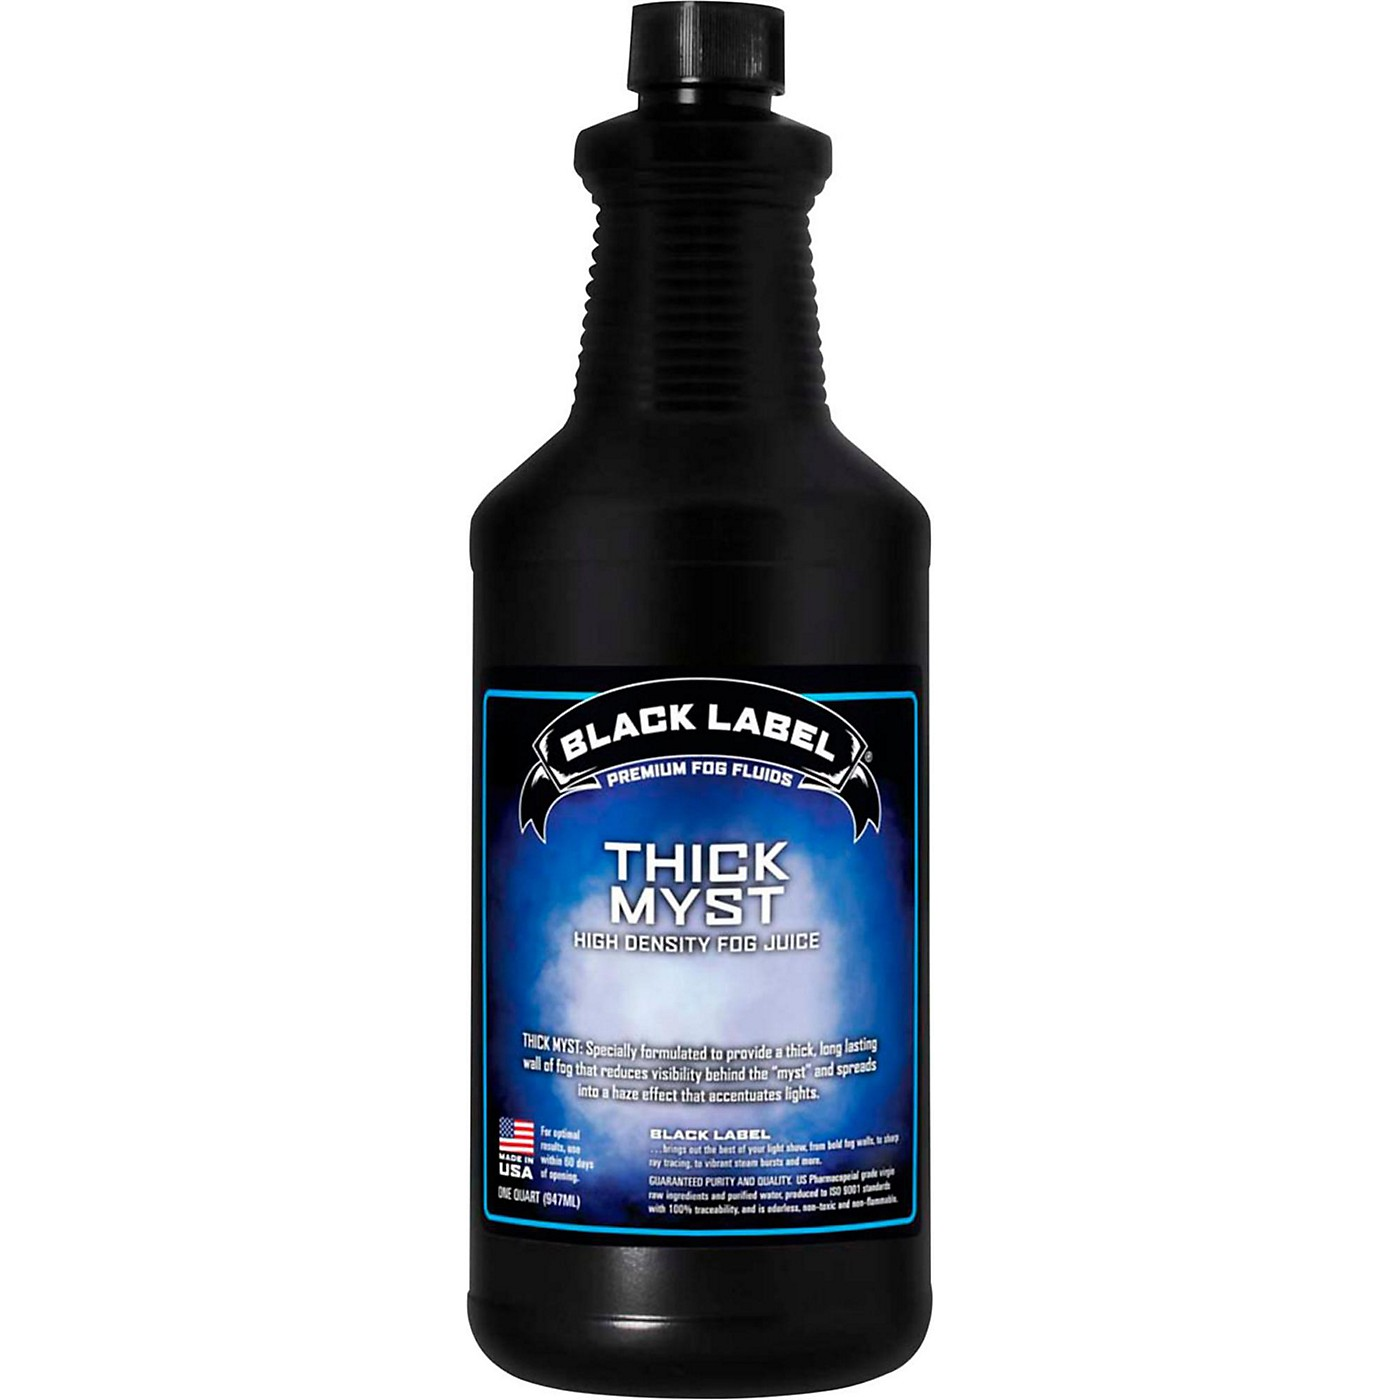 Black Label Thick Myst High Density Fog Juice - 1 Quart thumbnail